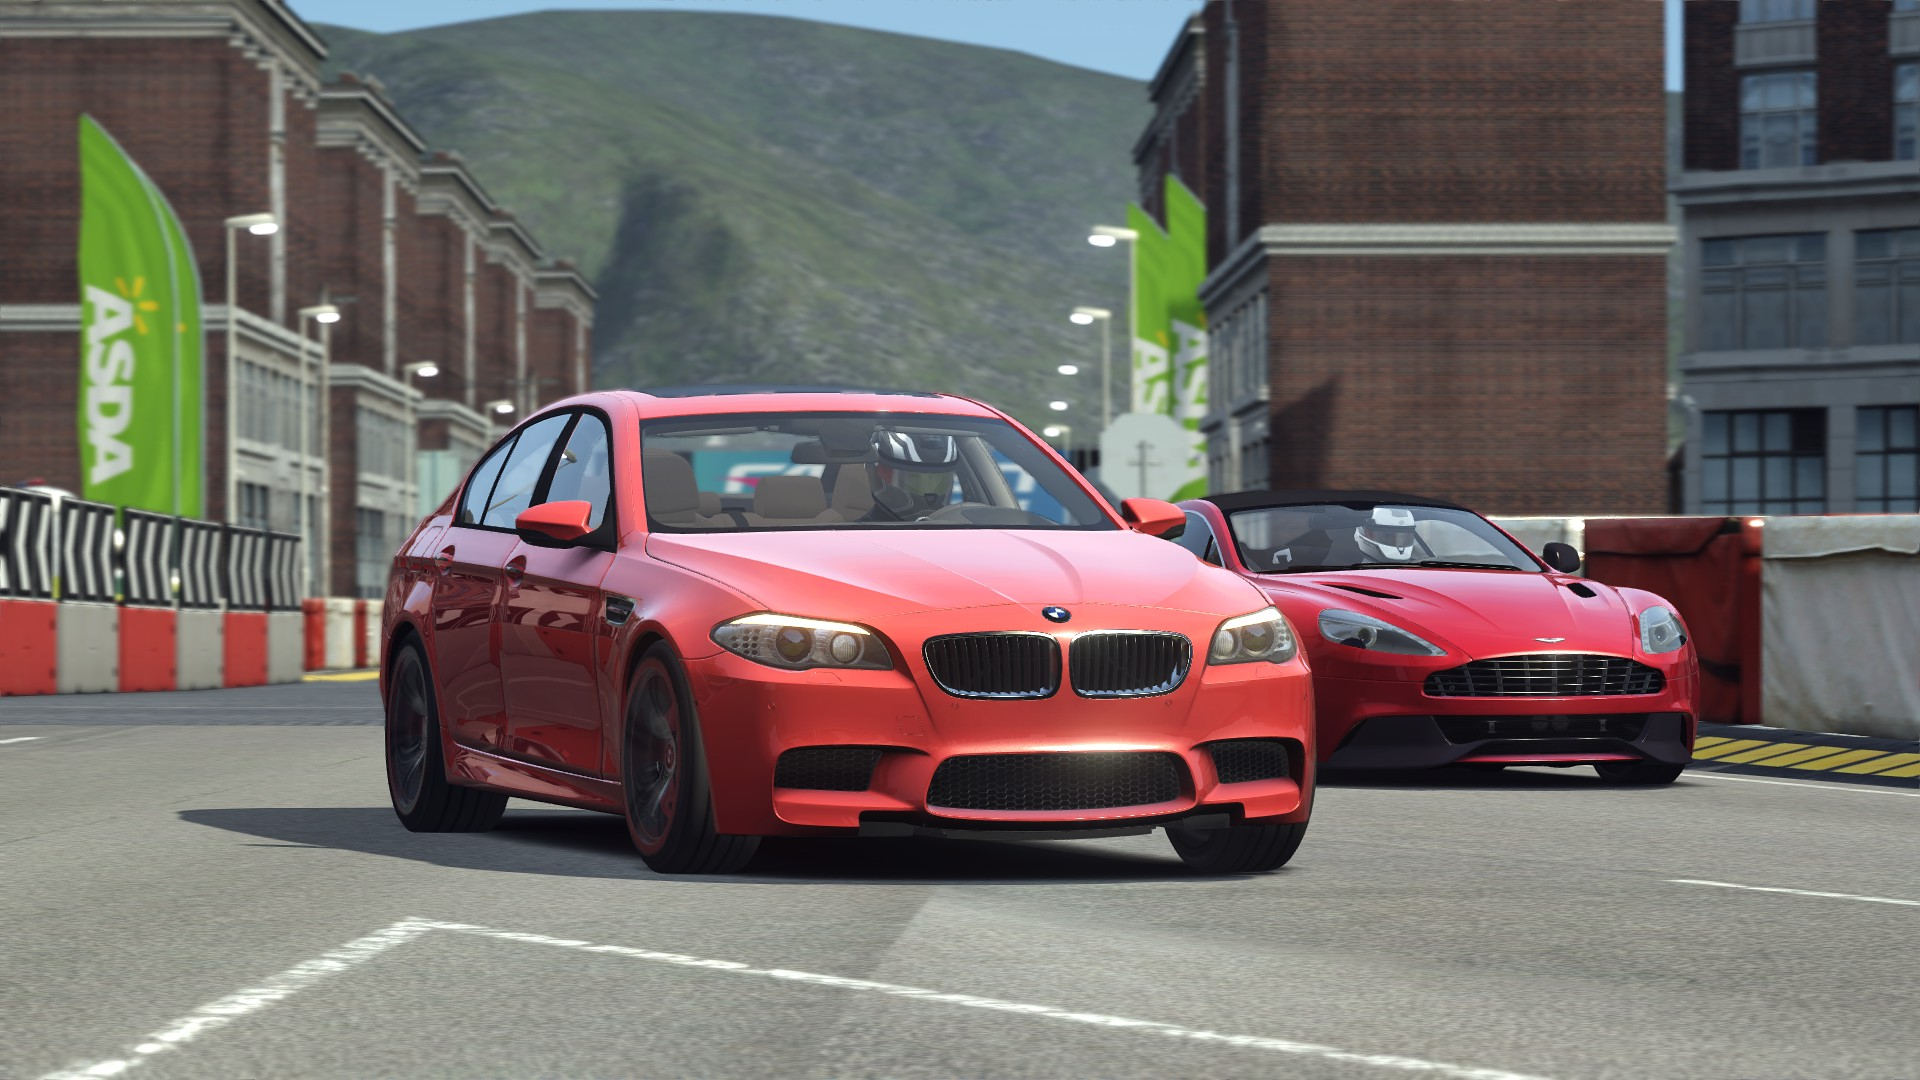 BMW M5 F10 Assetto Corsa 1.14 006.jpg